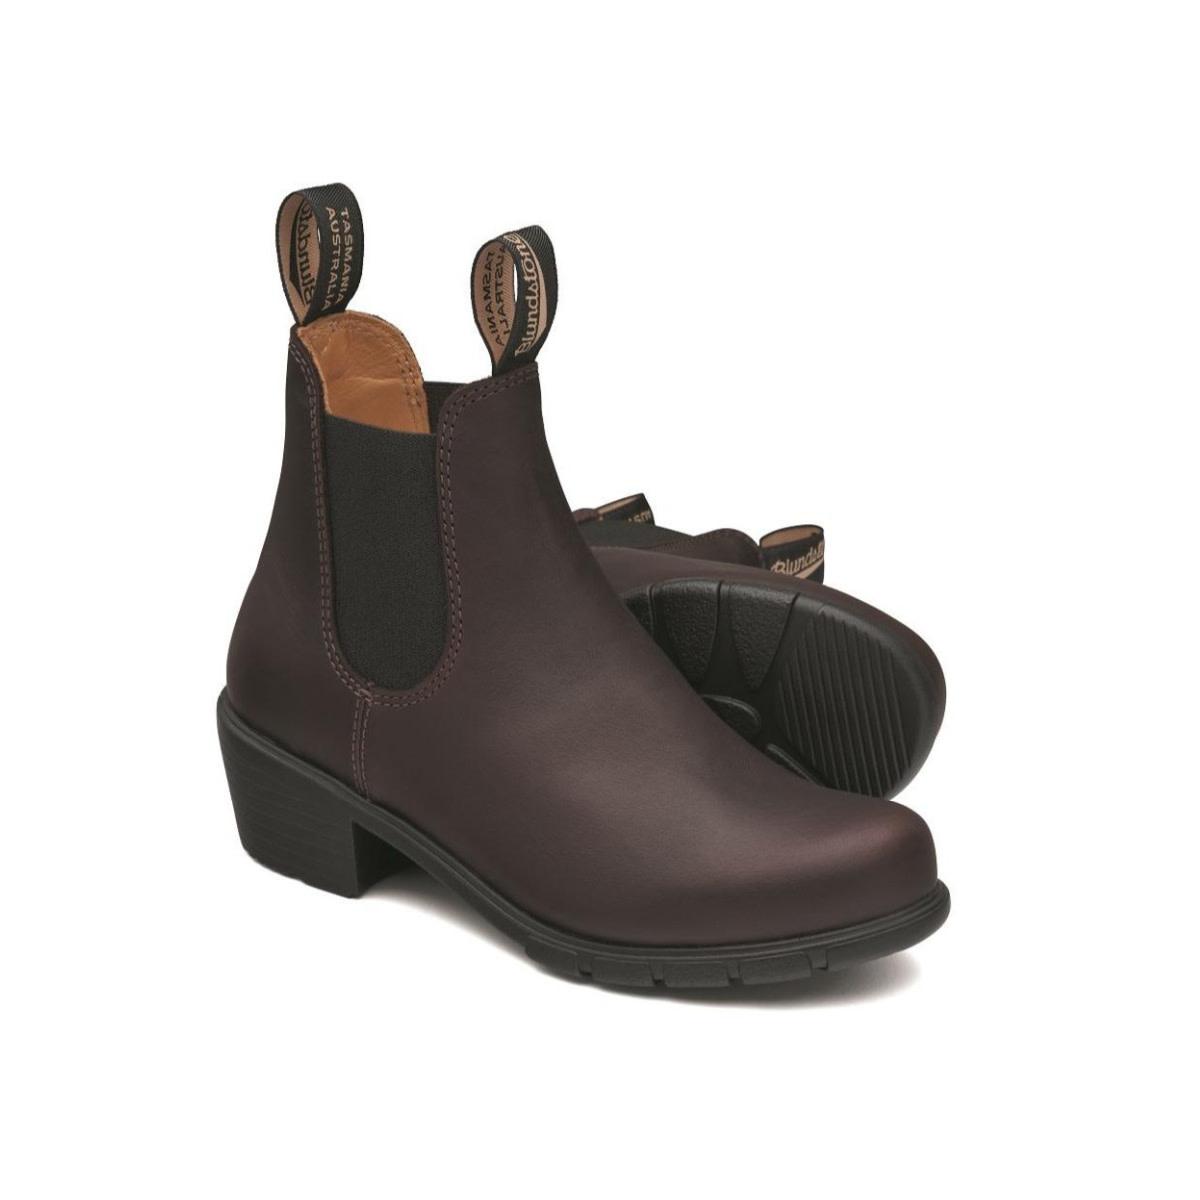 Blundstone Blundstone 2060 Women's Series Heel Shiraz